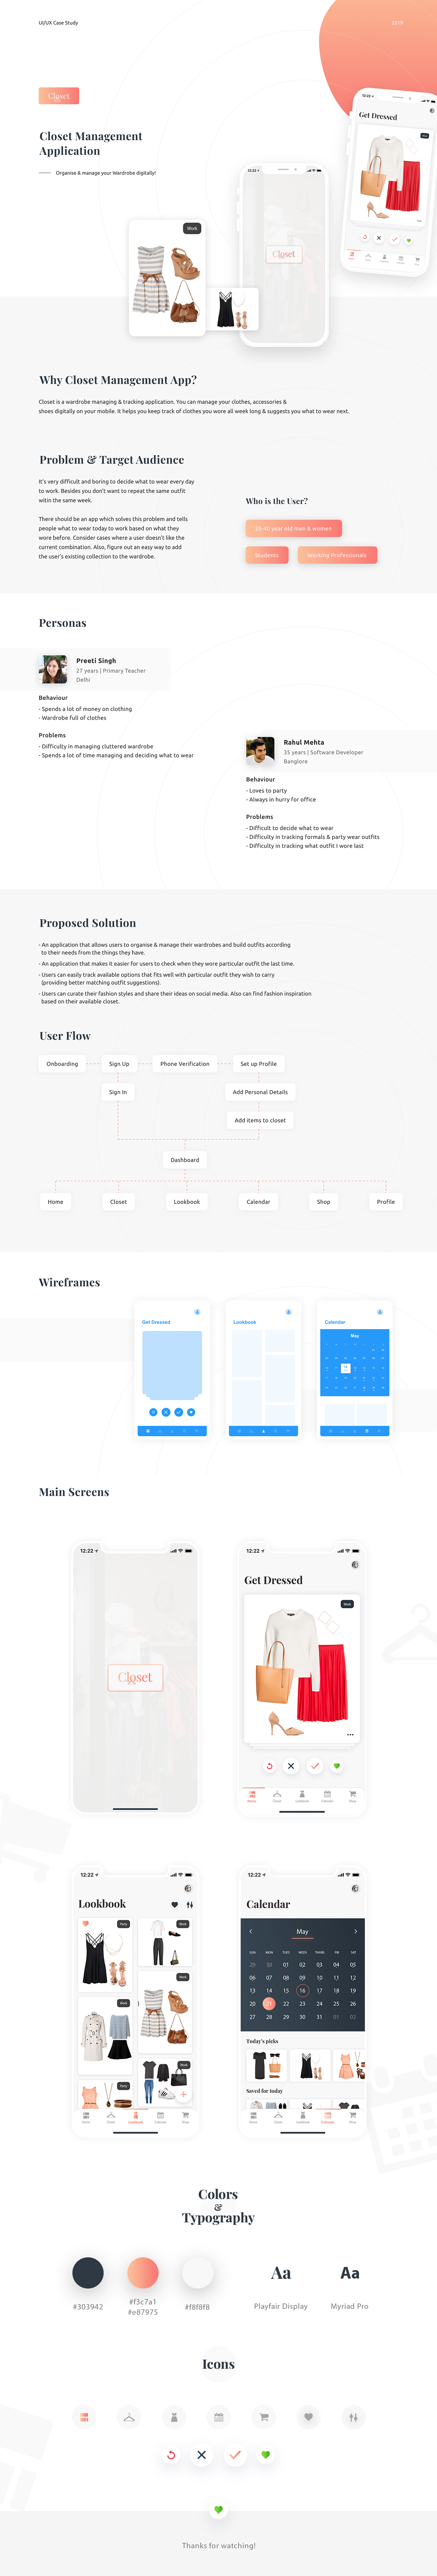 closetapp uiux ui_trends UserExperience Appdesign DailyUI UserInterface wireframing UI ux